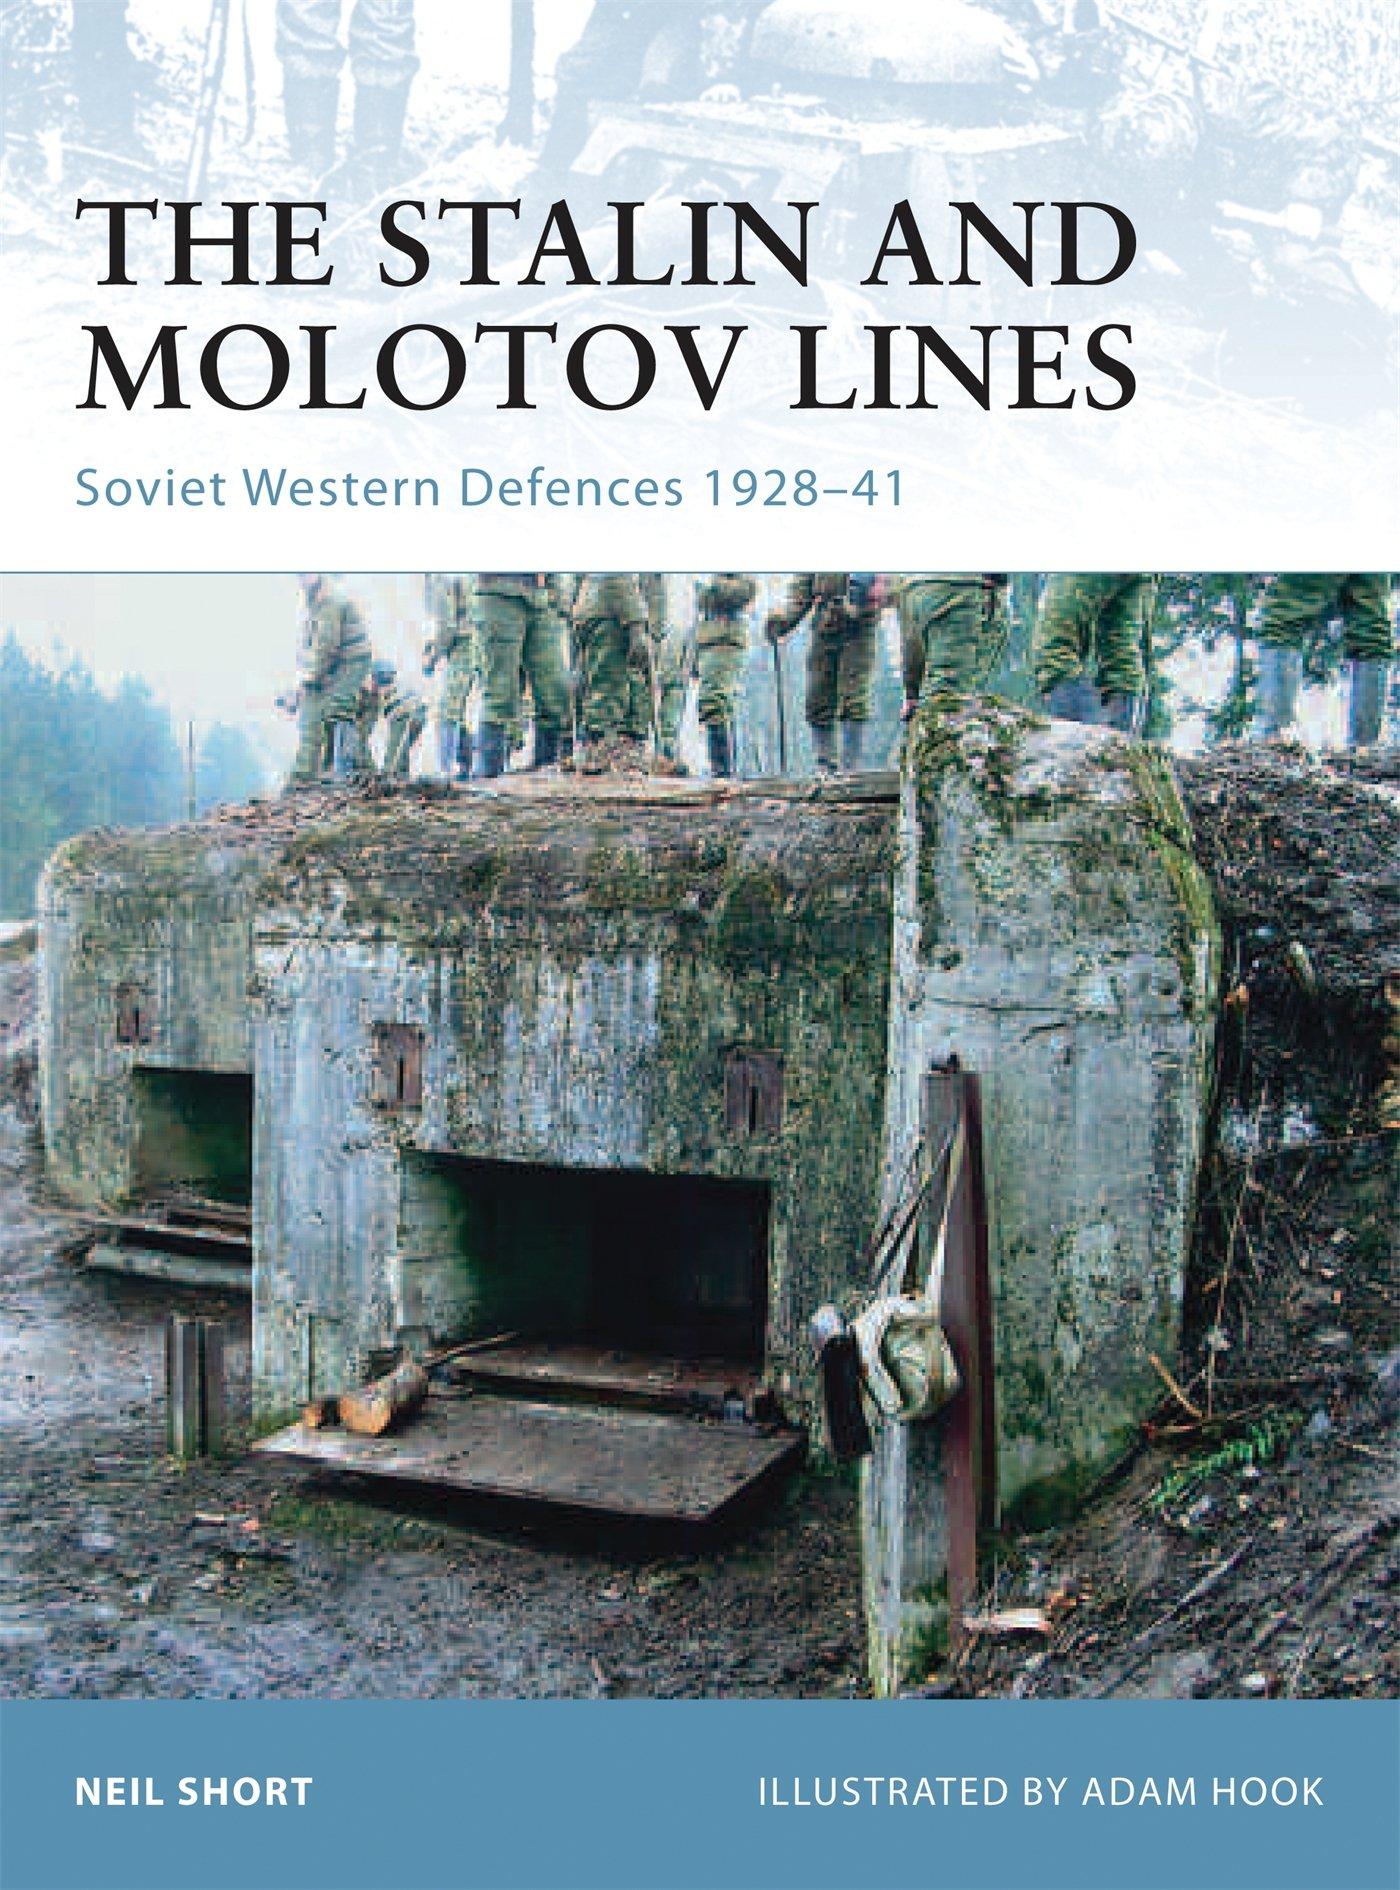 Defensive Line of Stalin 35